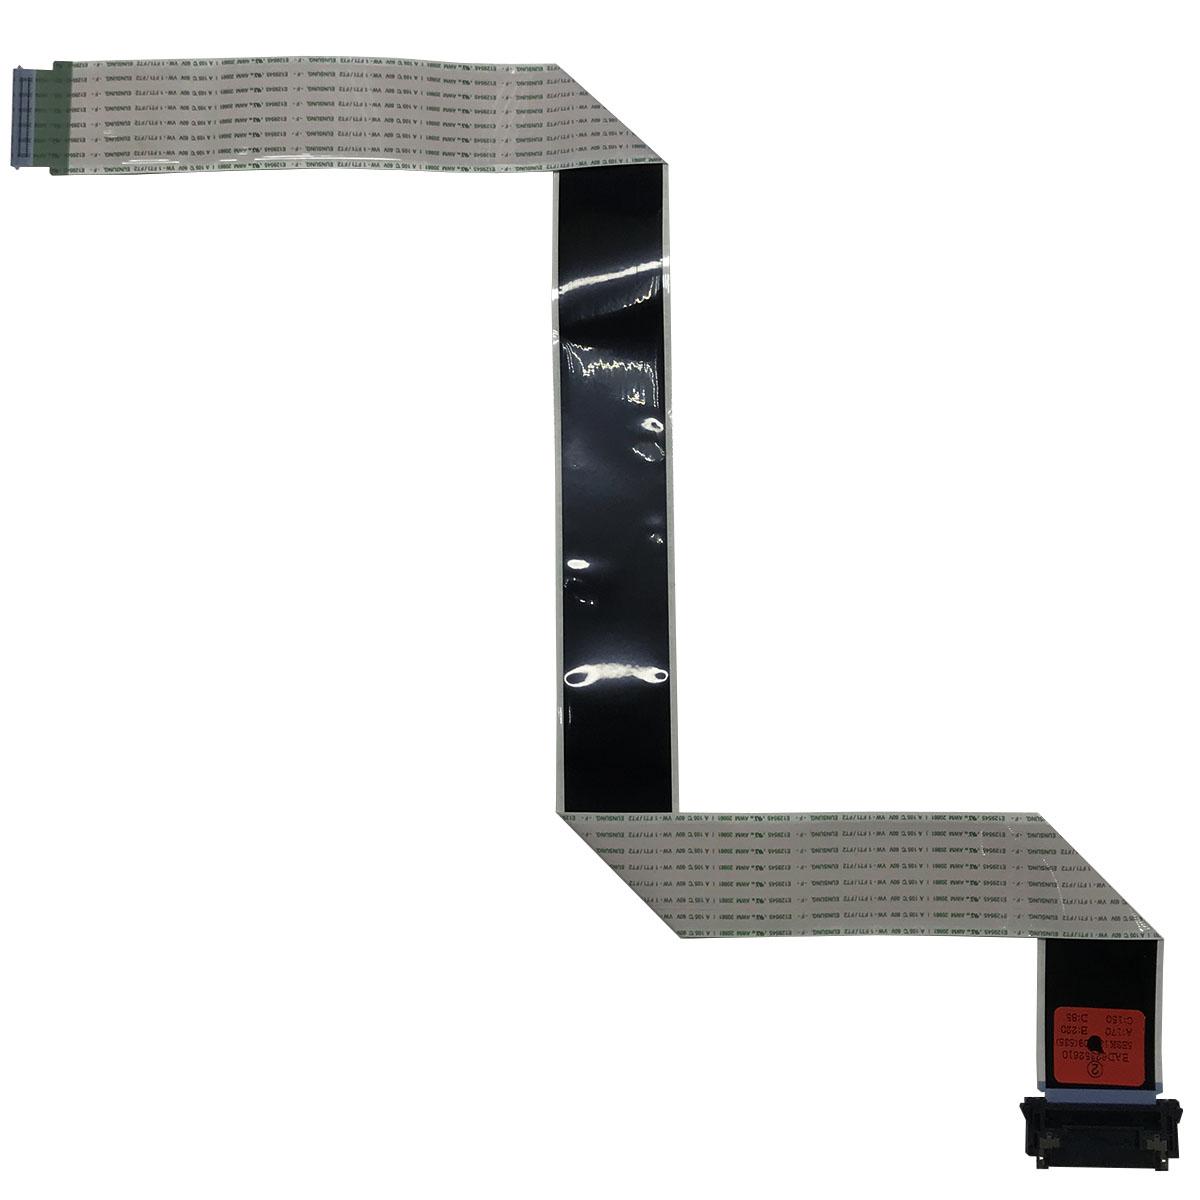 Шлейф EAD62352610 для LG 42LA660V, 42LA662V, 42LA667V и др.